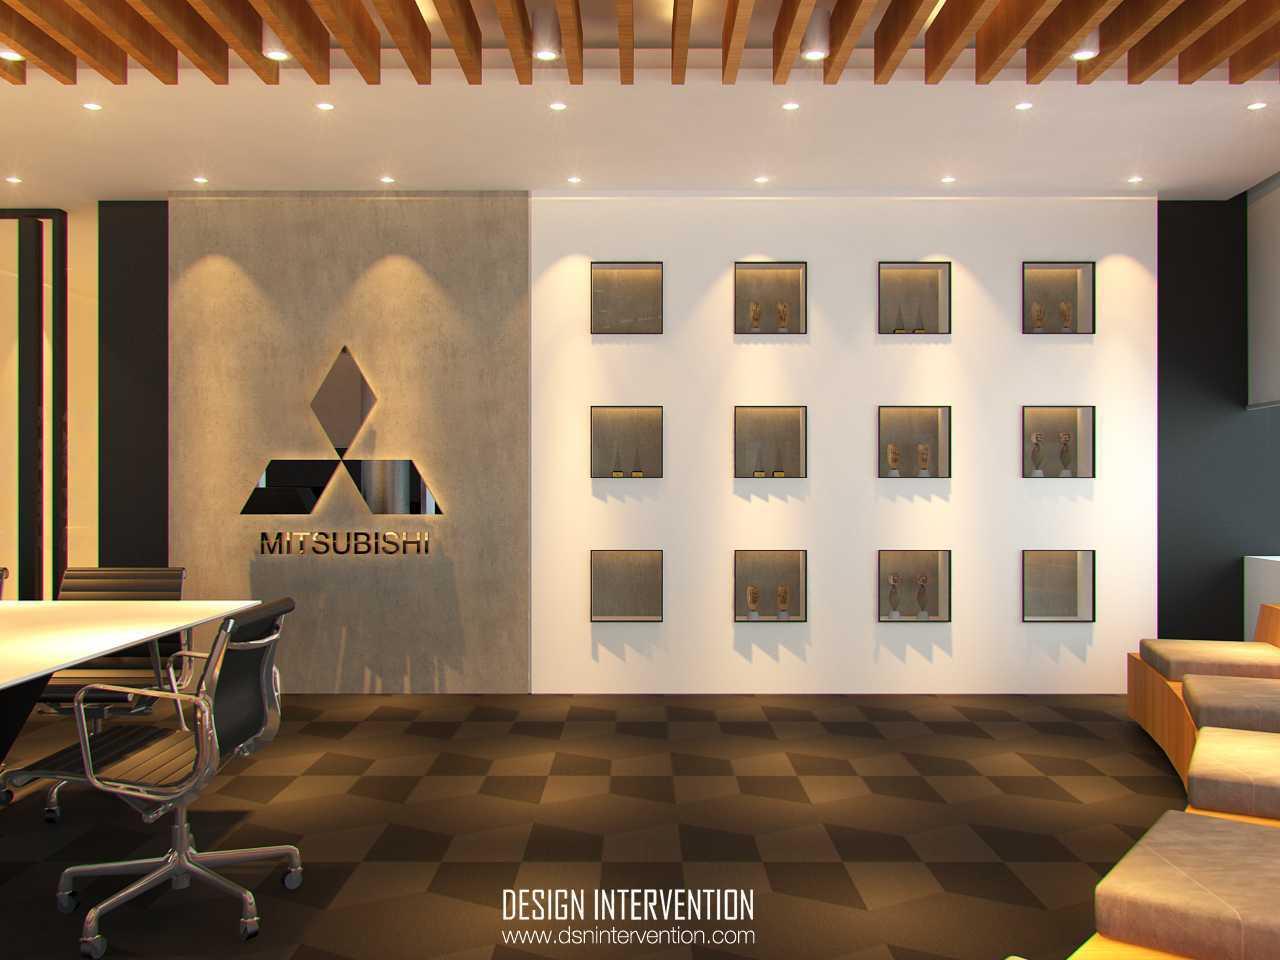 Design Intervention Mitsubishi Hq Office Tebet Tebet Meeting-Room-View  14983